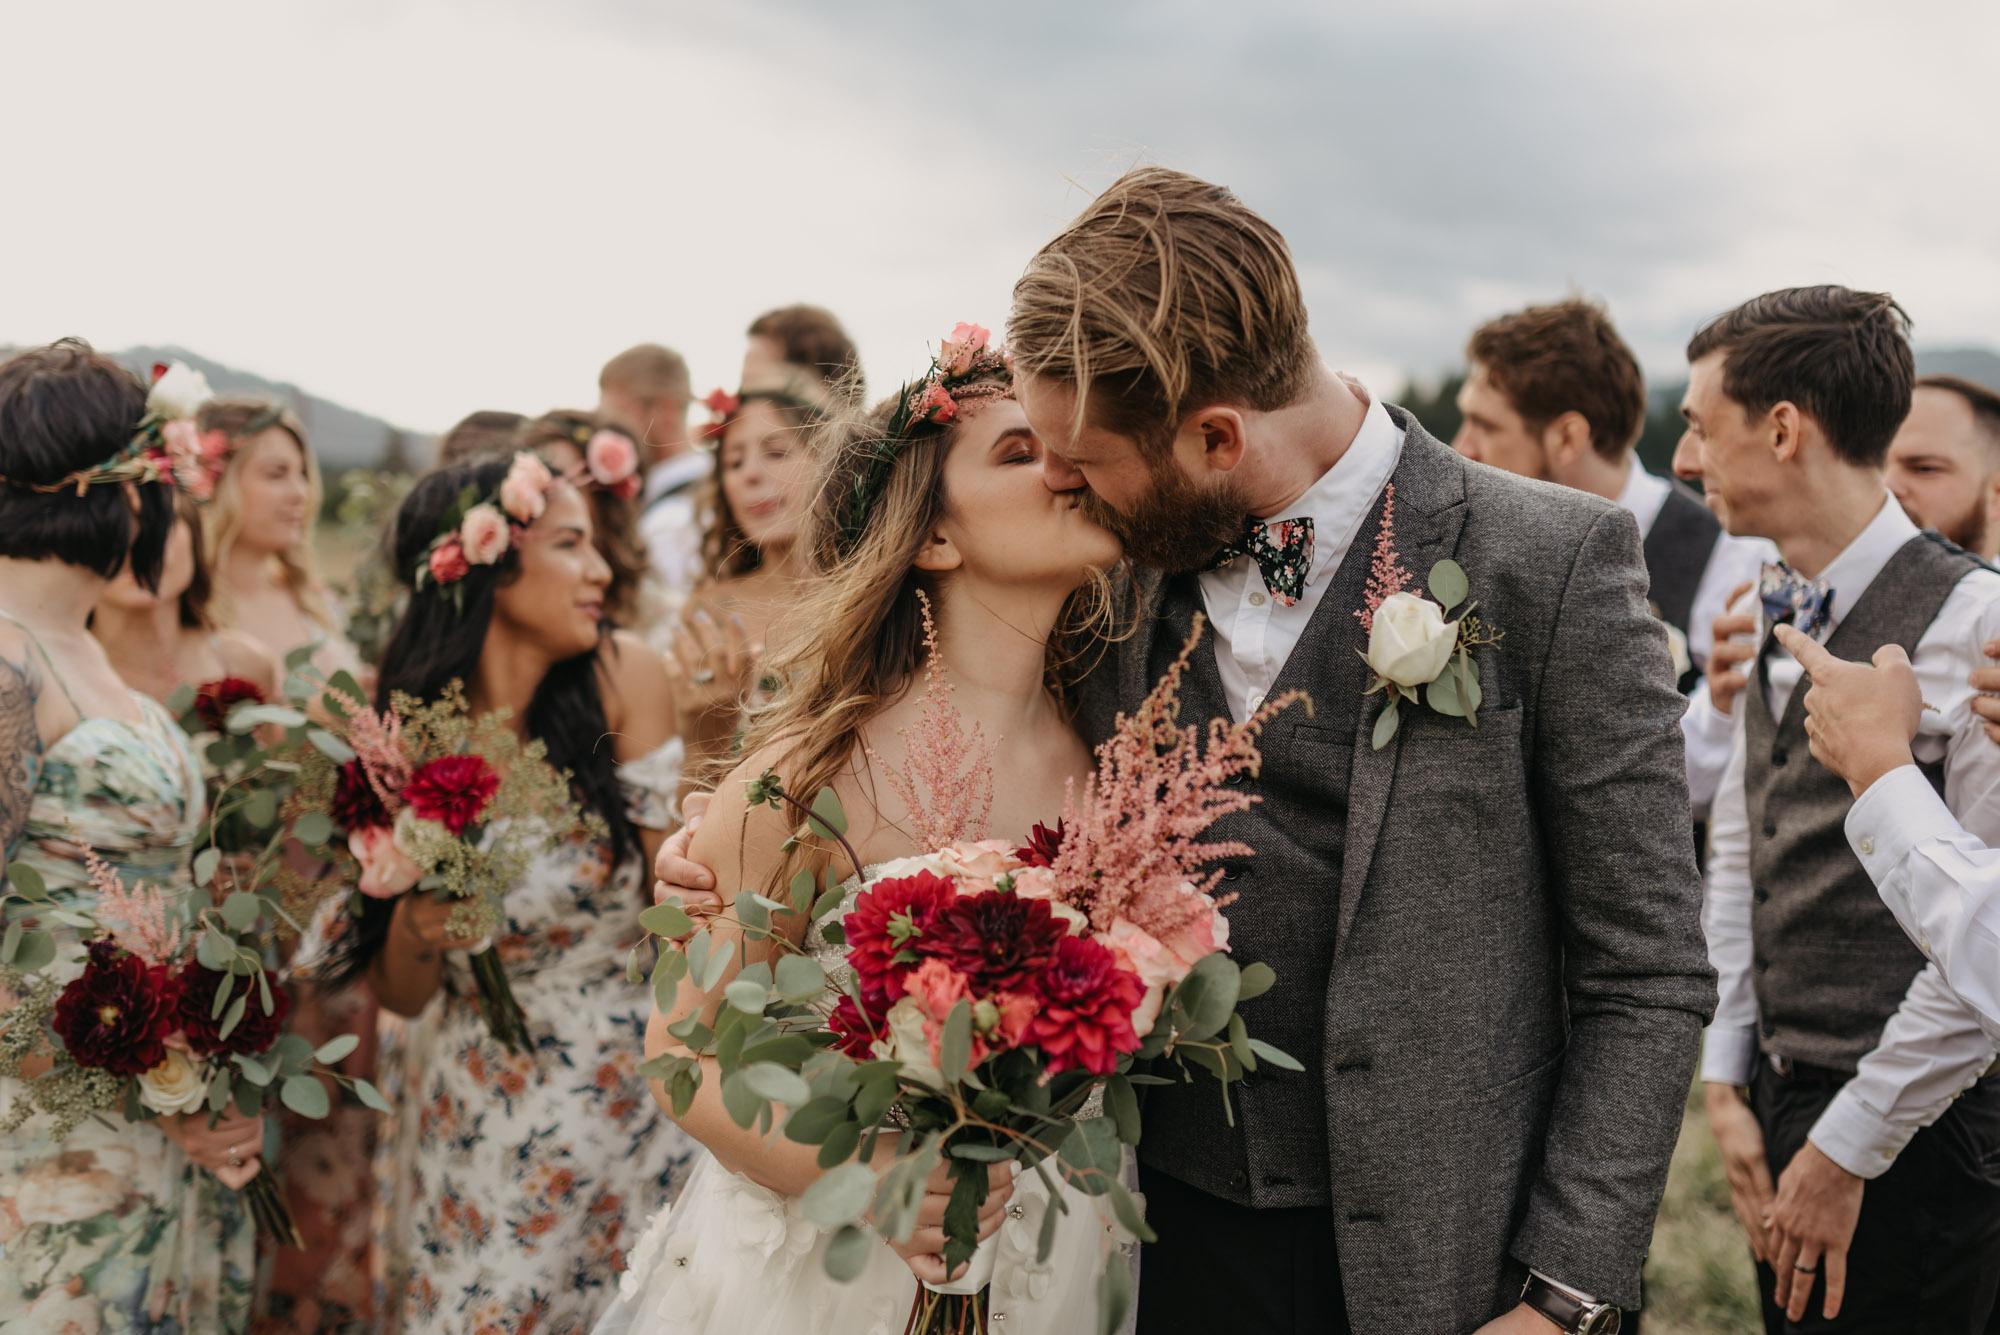 Bridal-Party-Free-People-Flower-Dresses-Washington-Wedding-8680.jpg